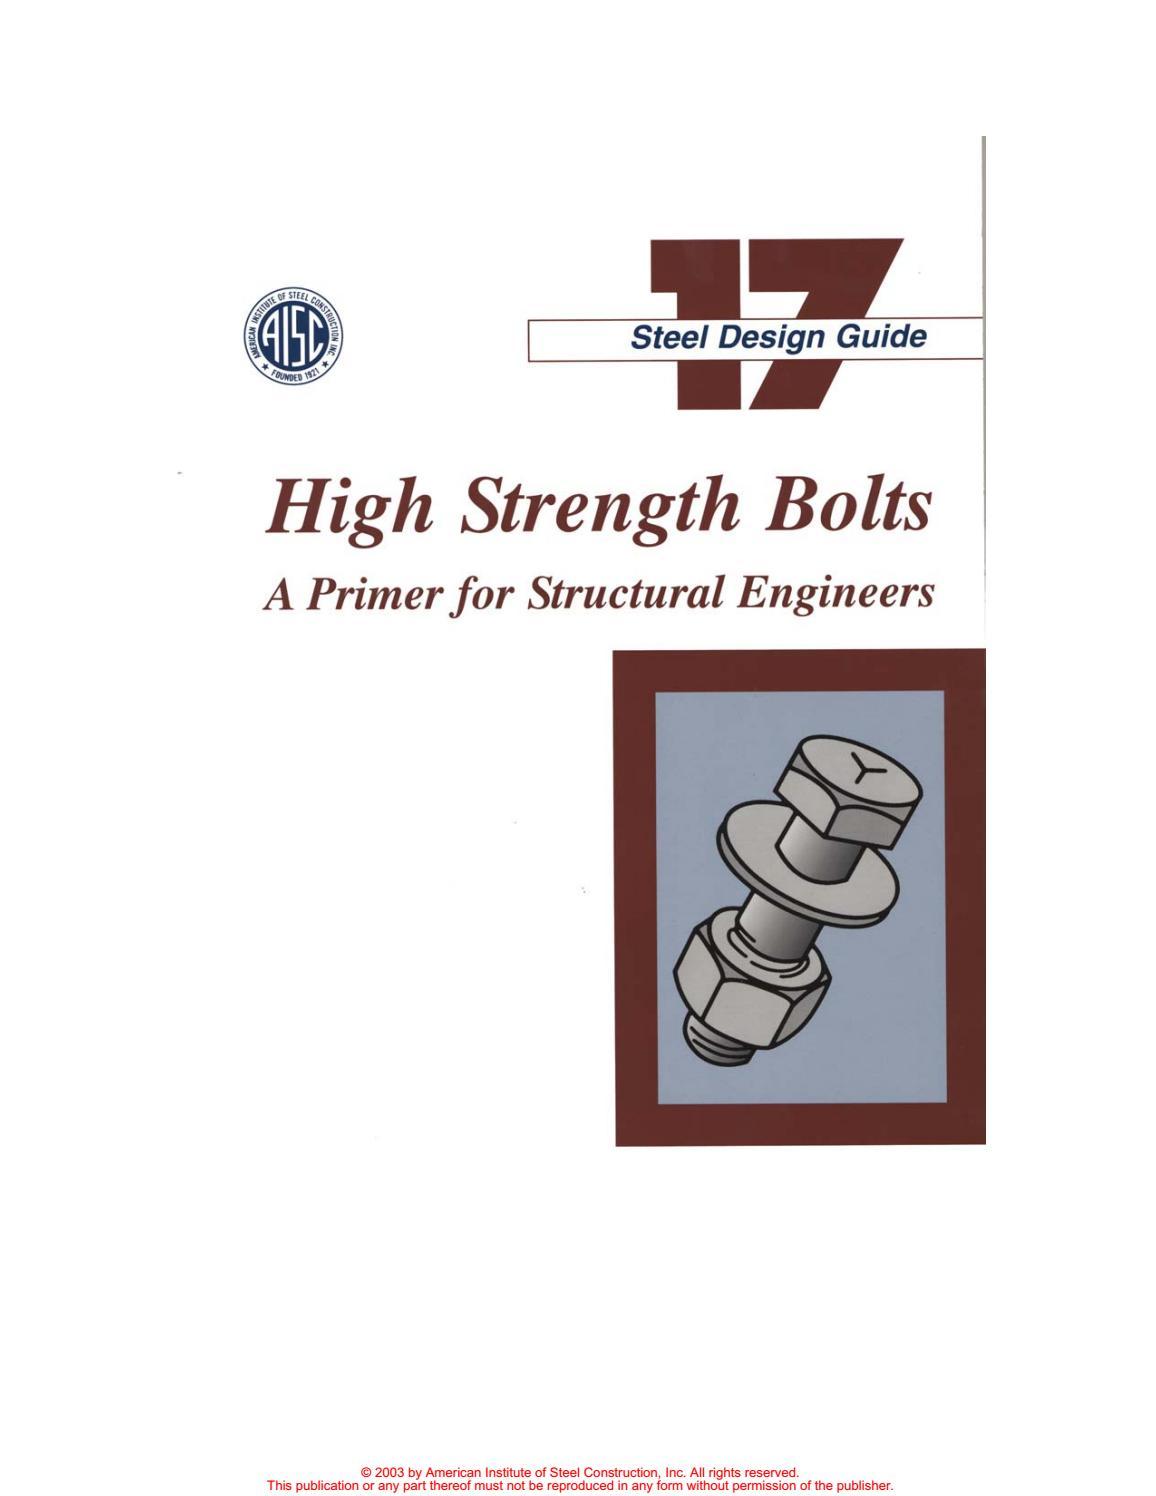 Aisc design guide 17 high strength bolts by Pedro Antonio